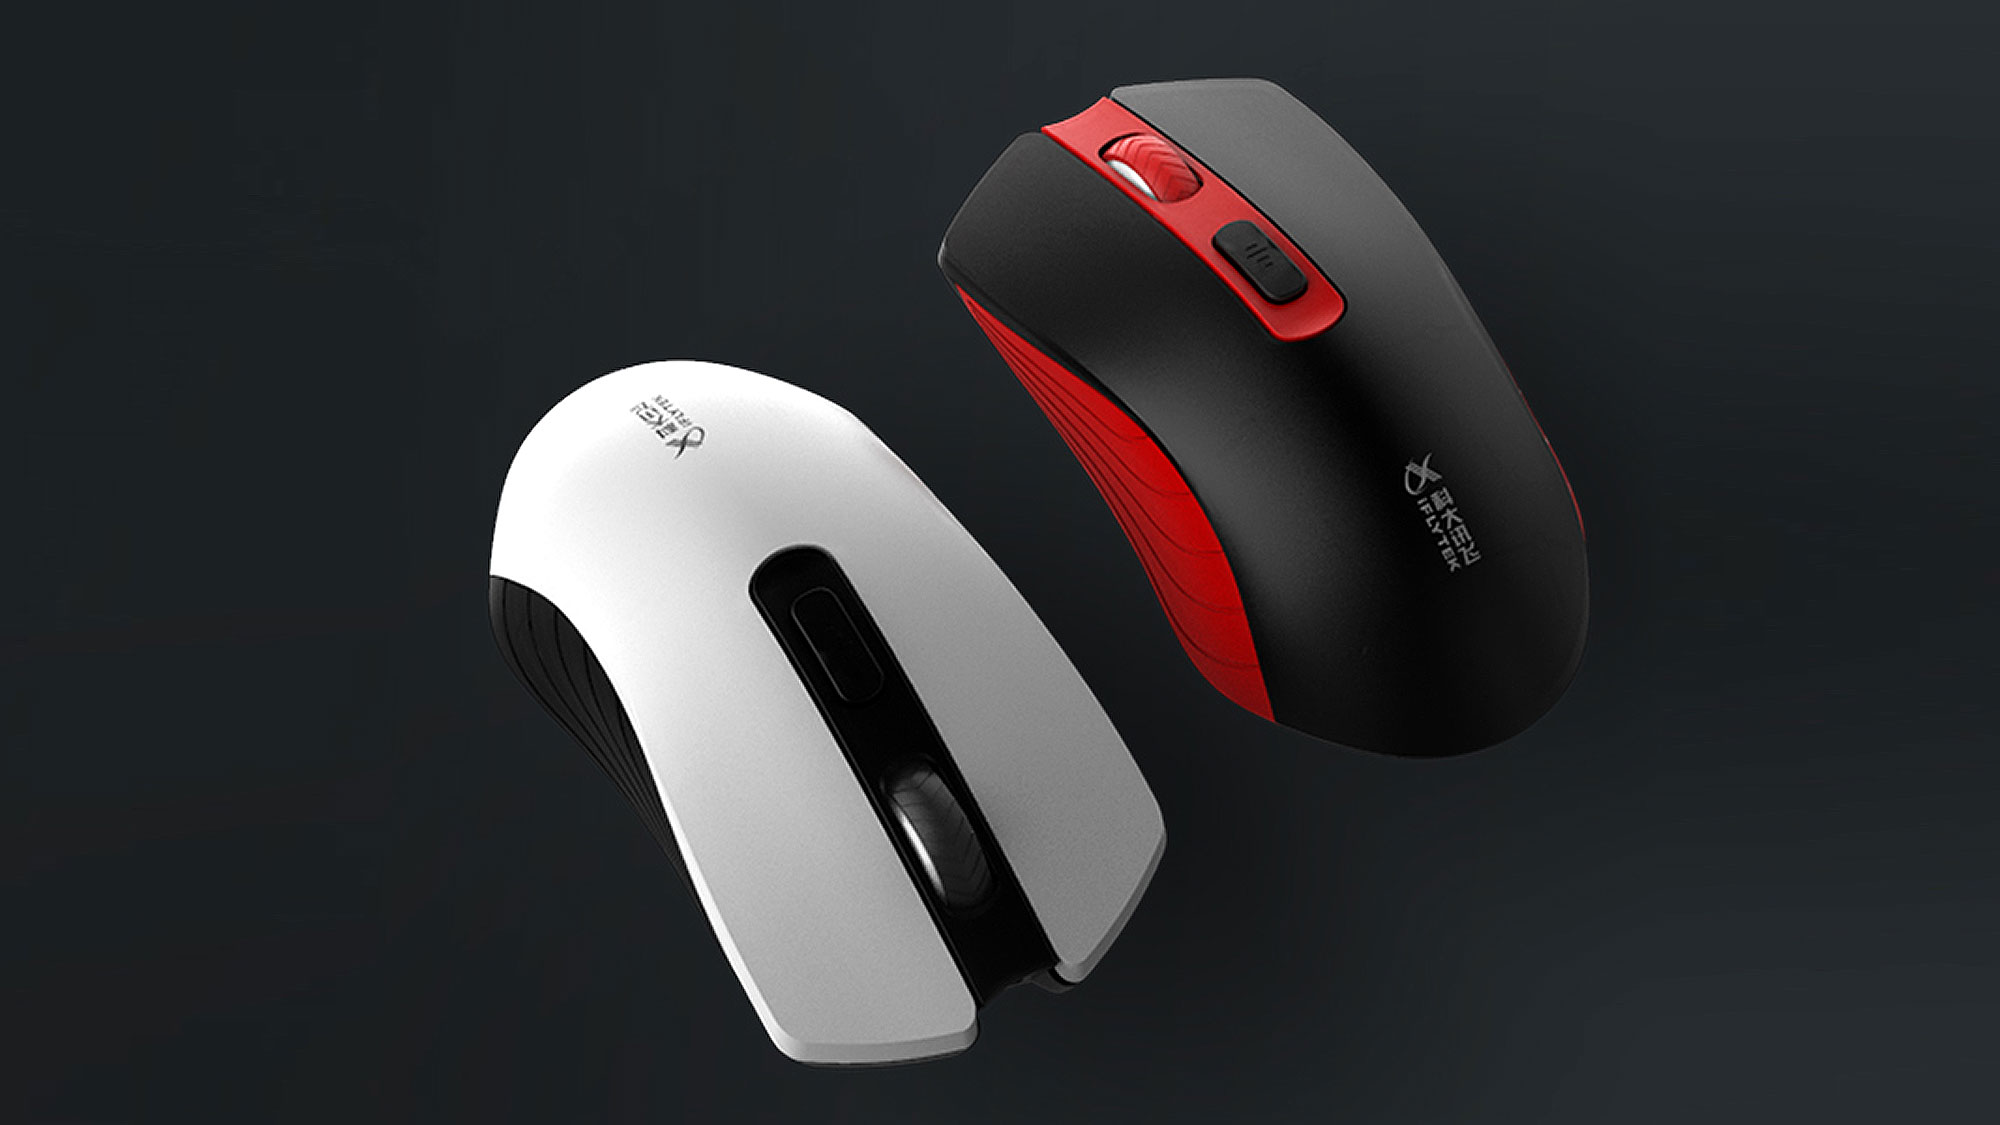 iFLYTEK M210 Smart Voice Input Mouse